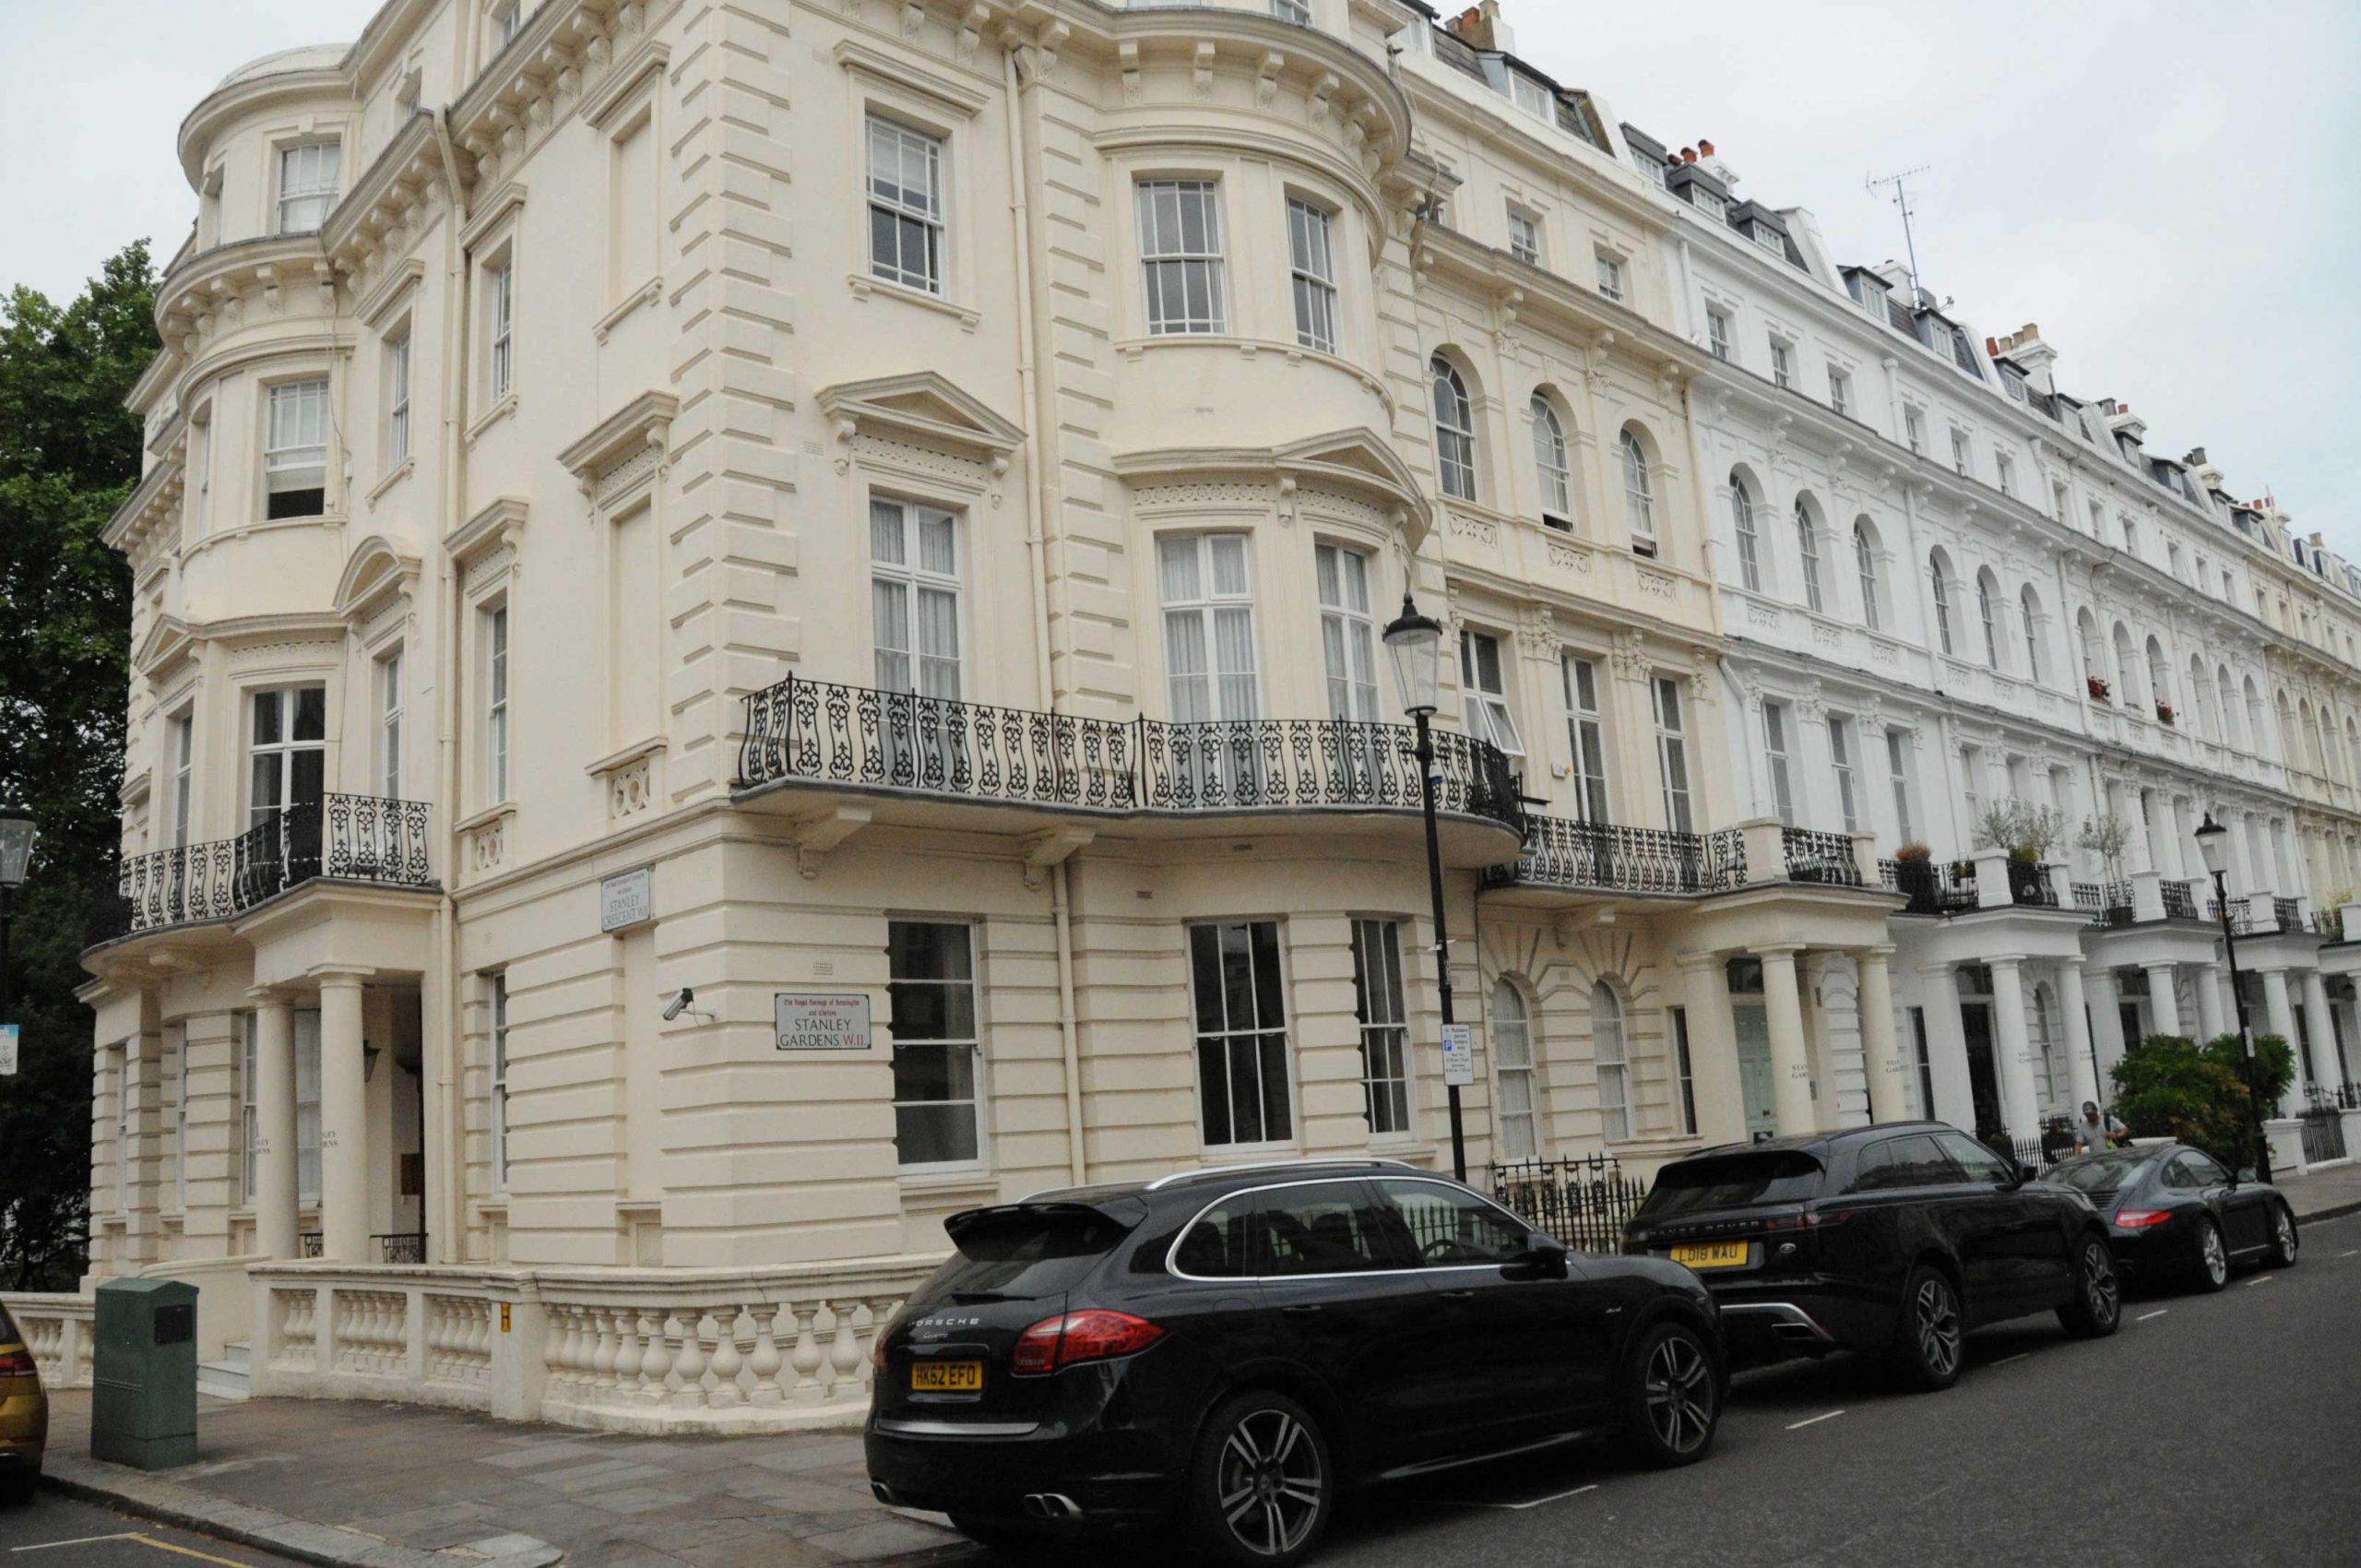 James Bond's flat